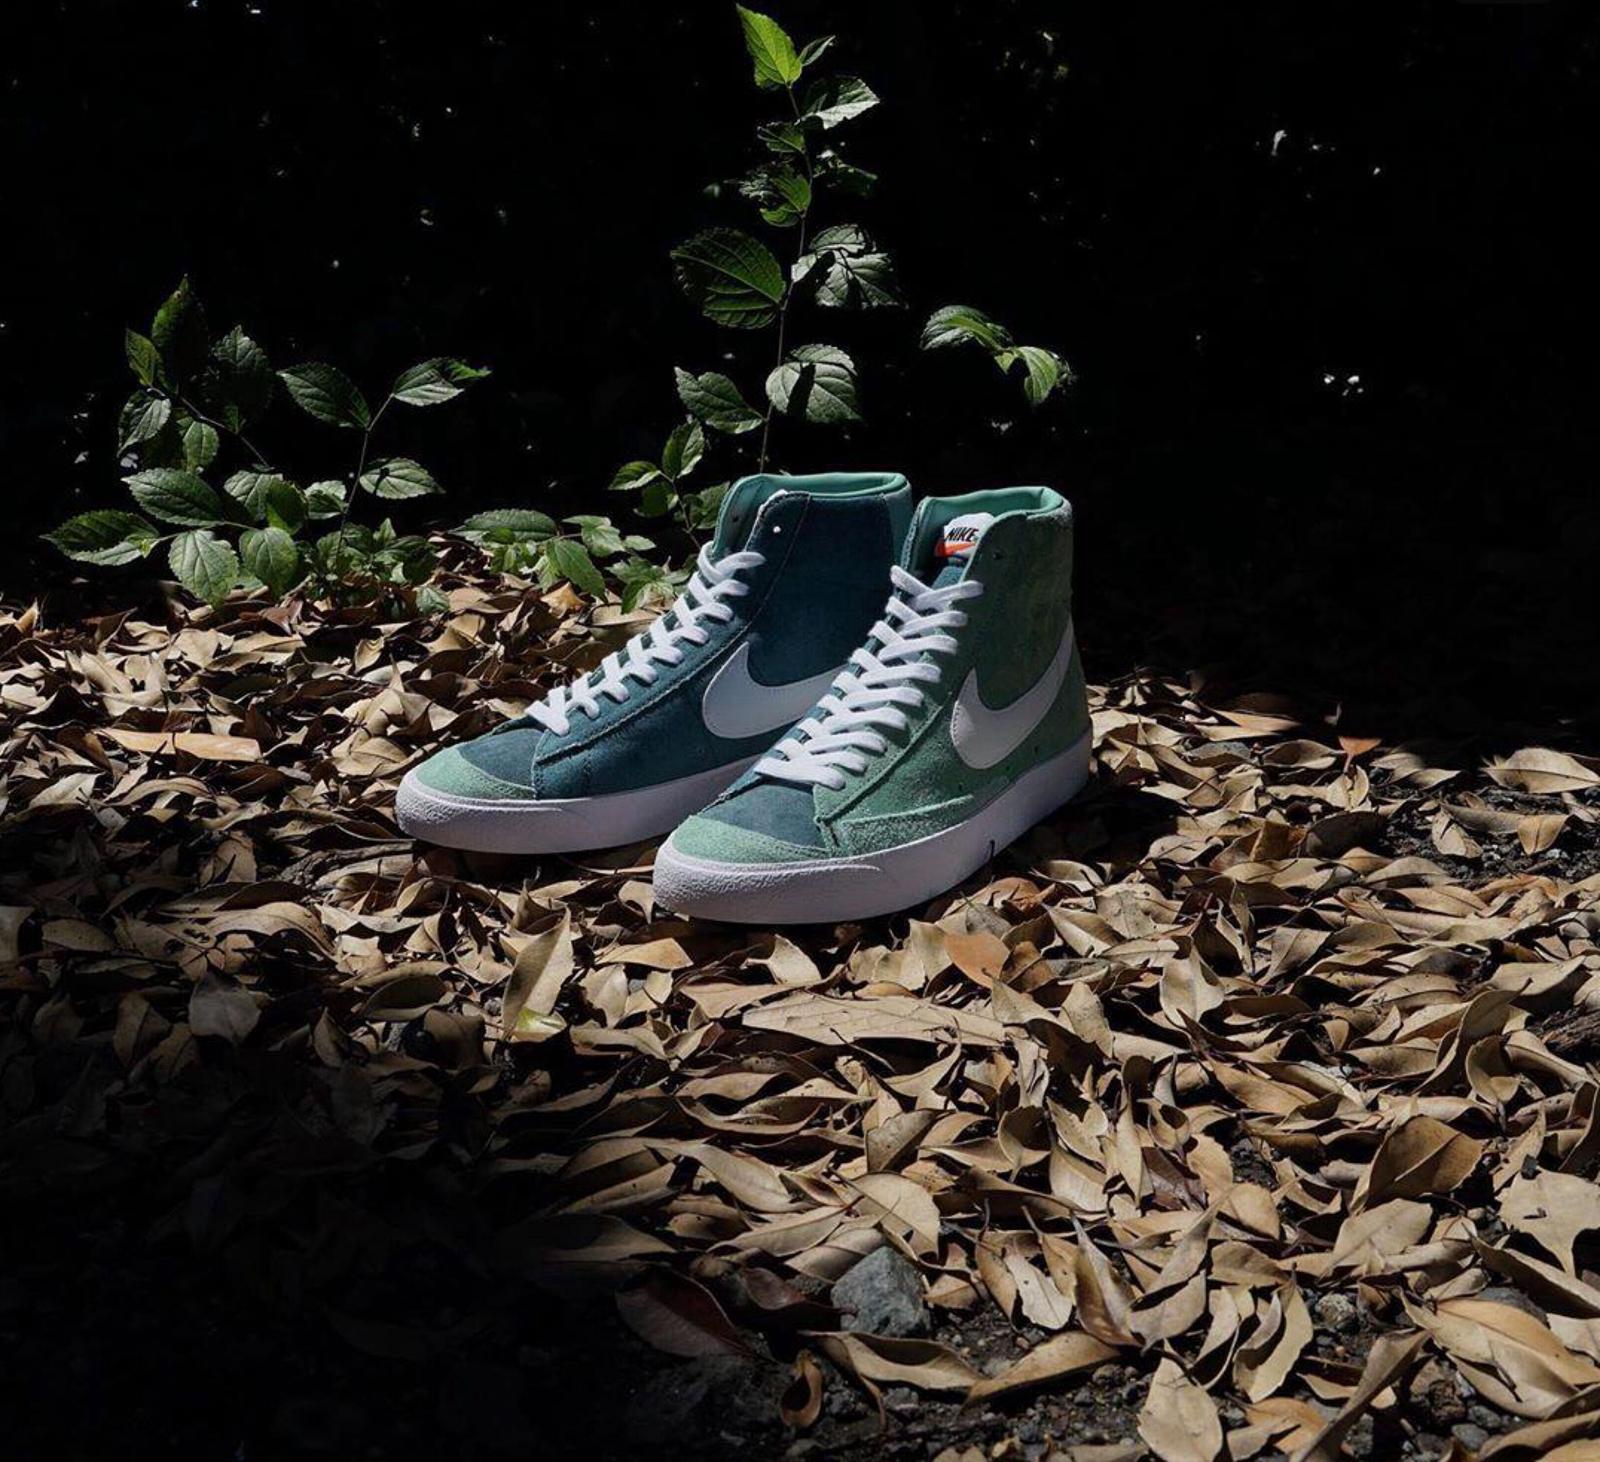 Nike Blazer Mid '77 VNTG全新治愈翡翠绿/白/灰绿配色即将发售